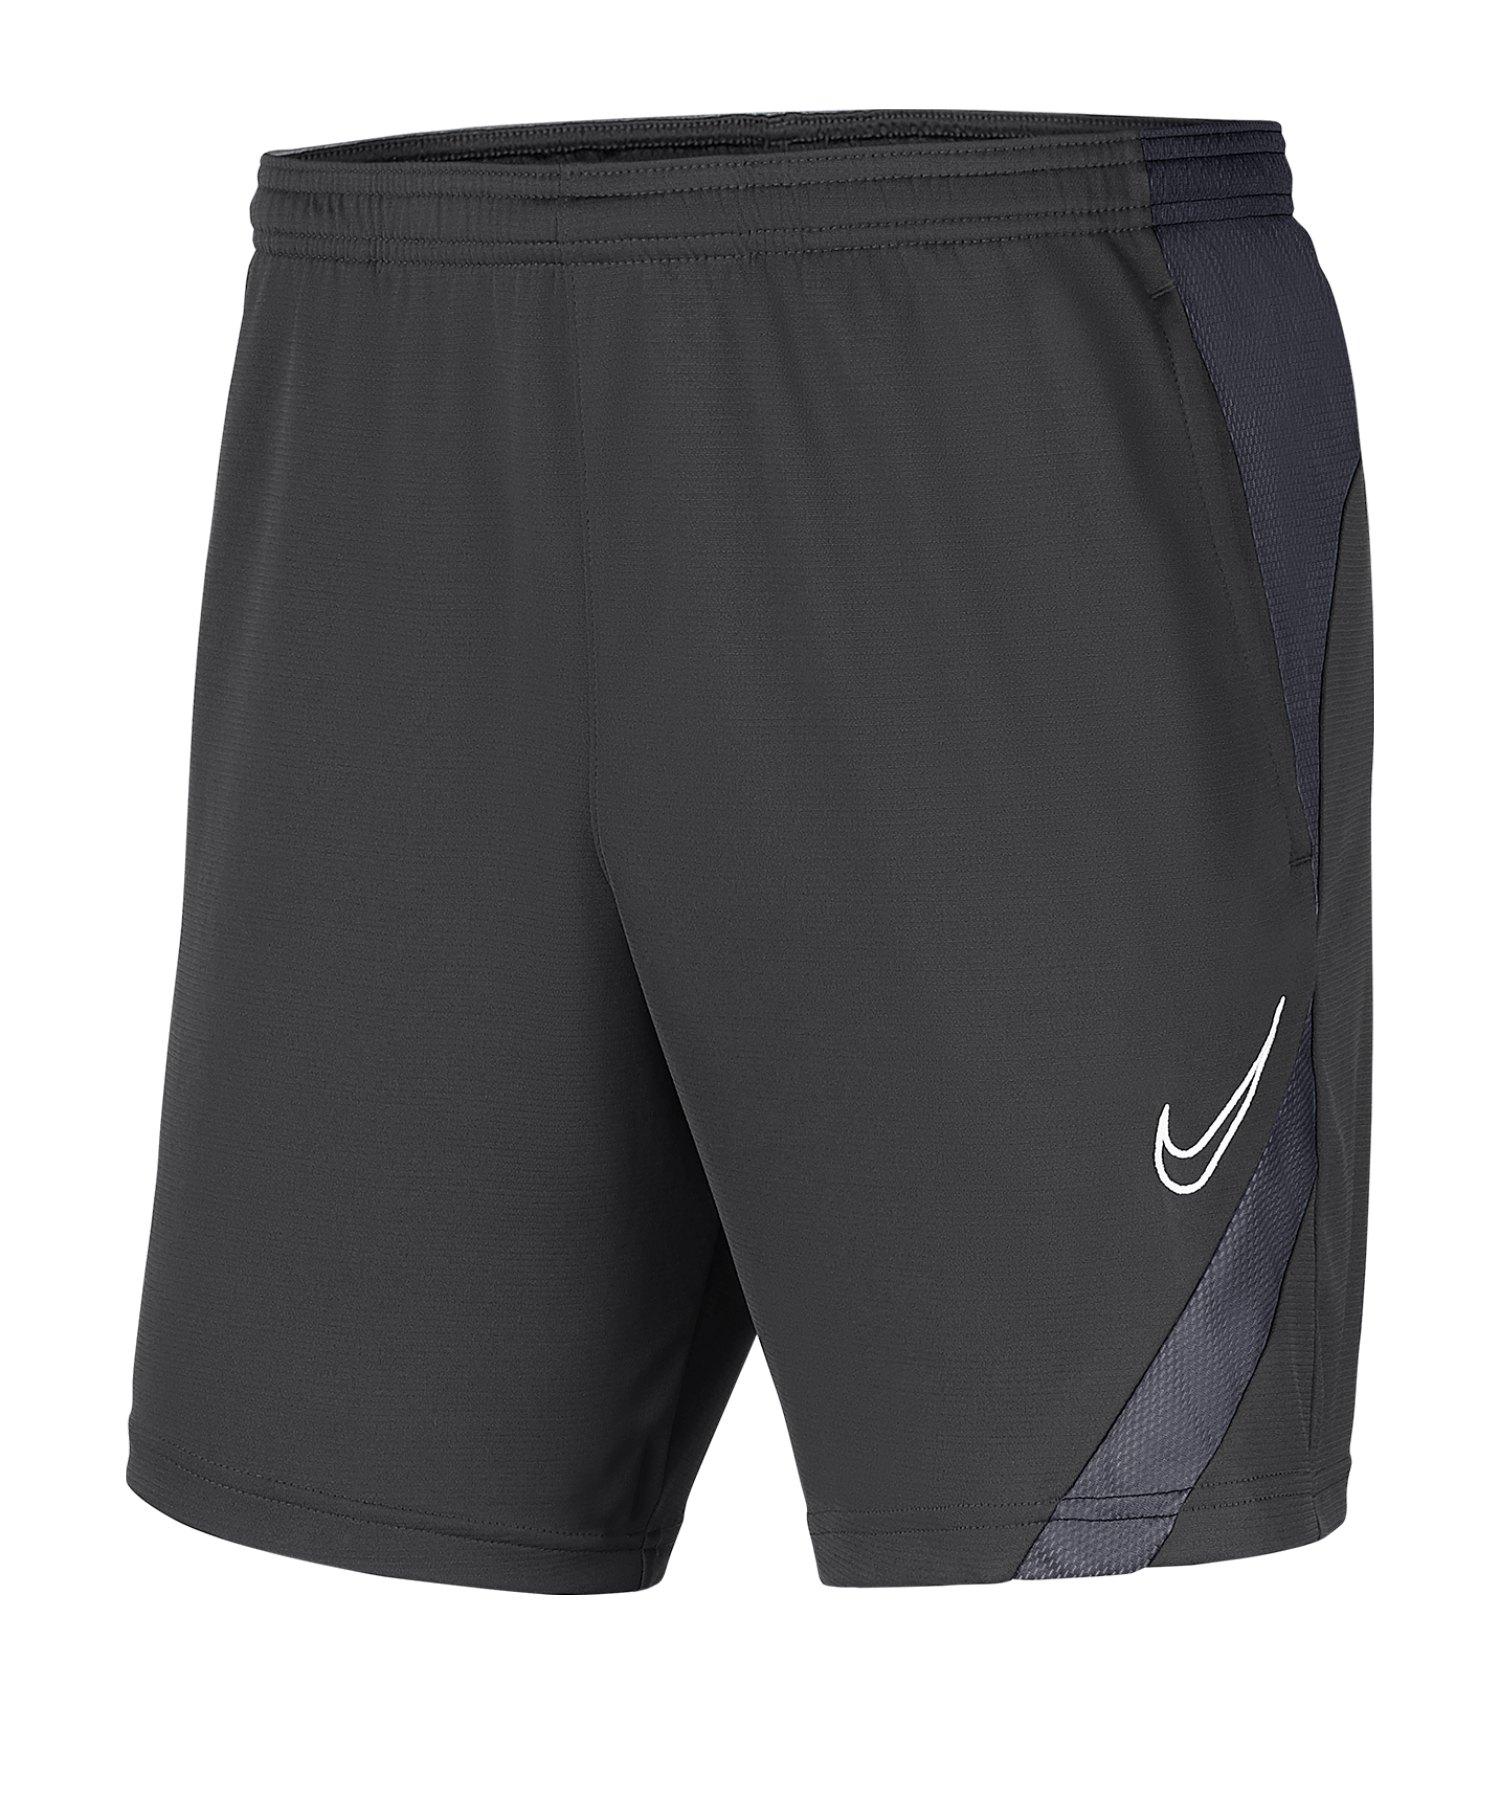 Nike Academy Pro Short Grau F066 - grau